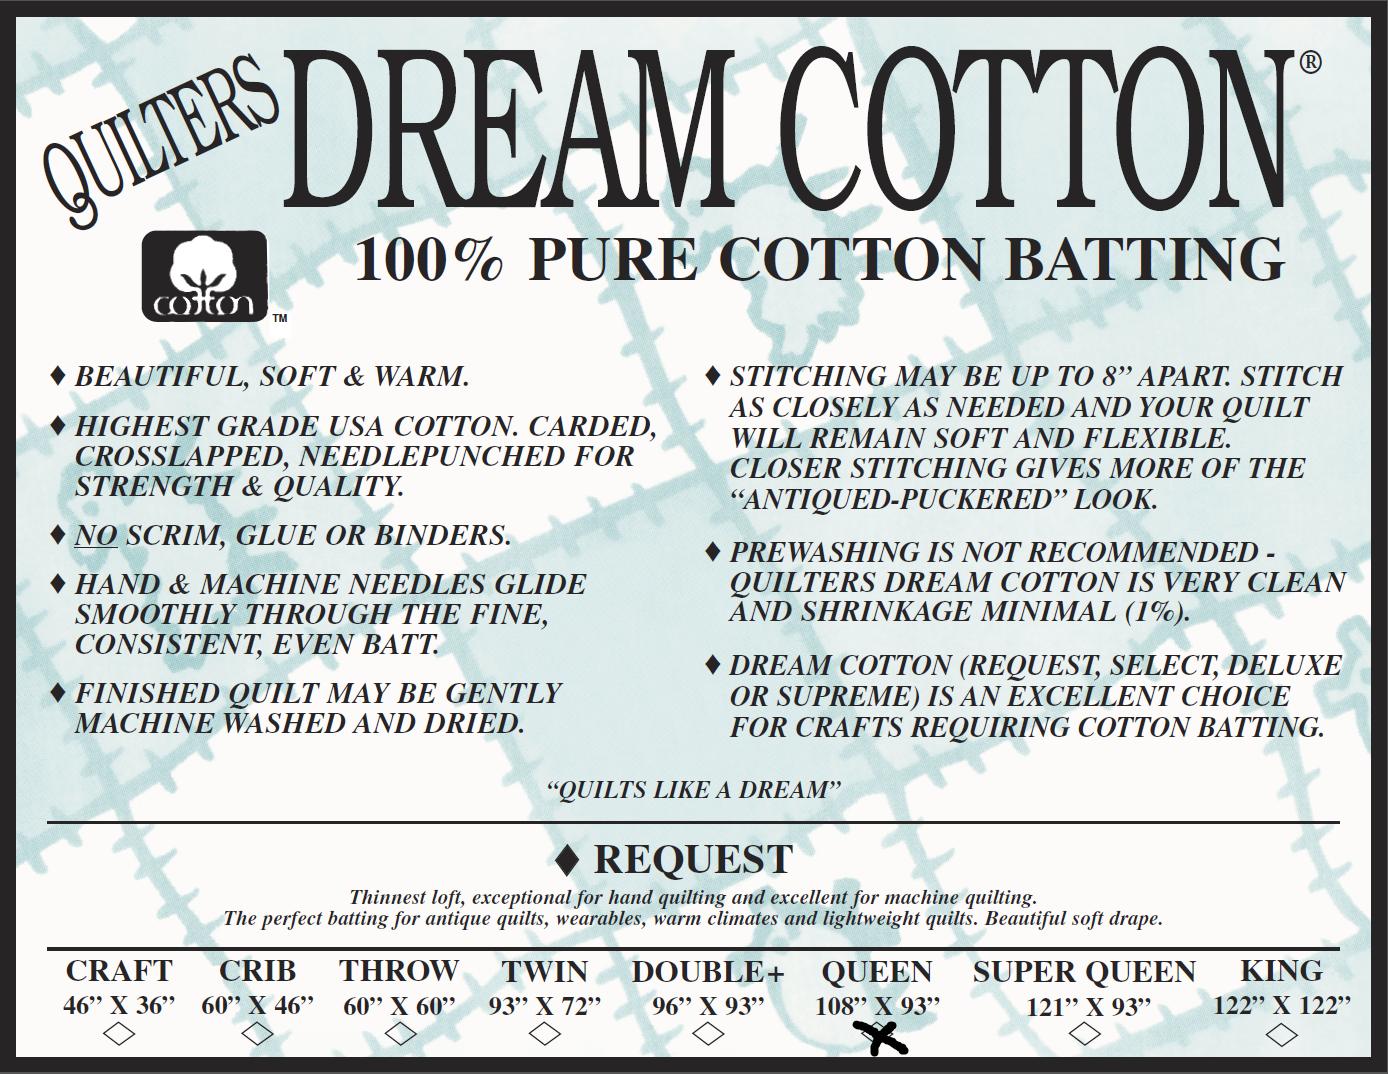 Request Queen 108 x93 Quilter's Dream Cotton